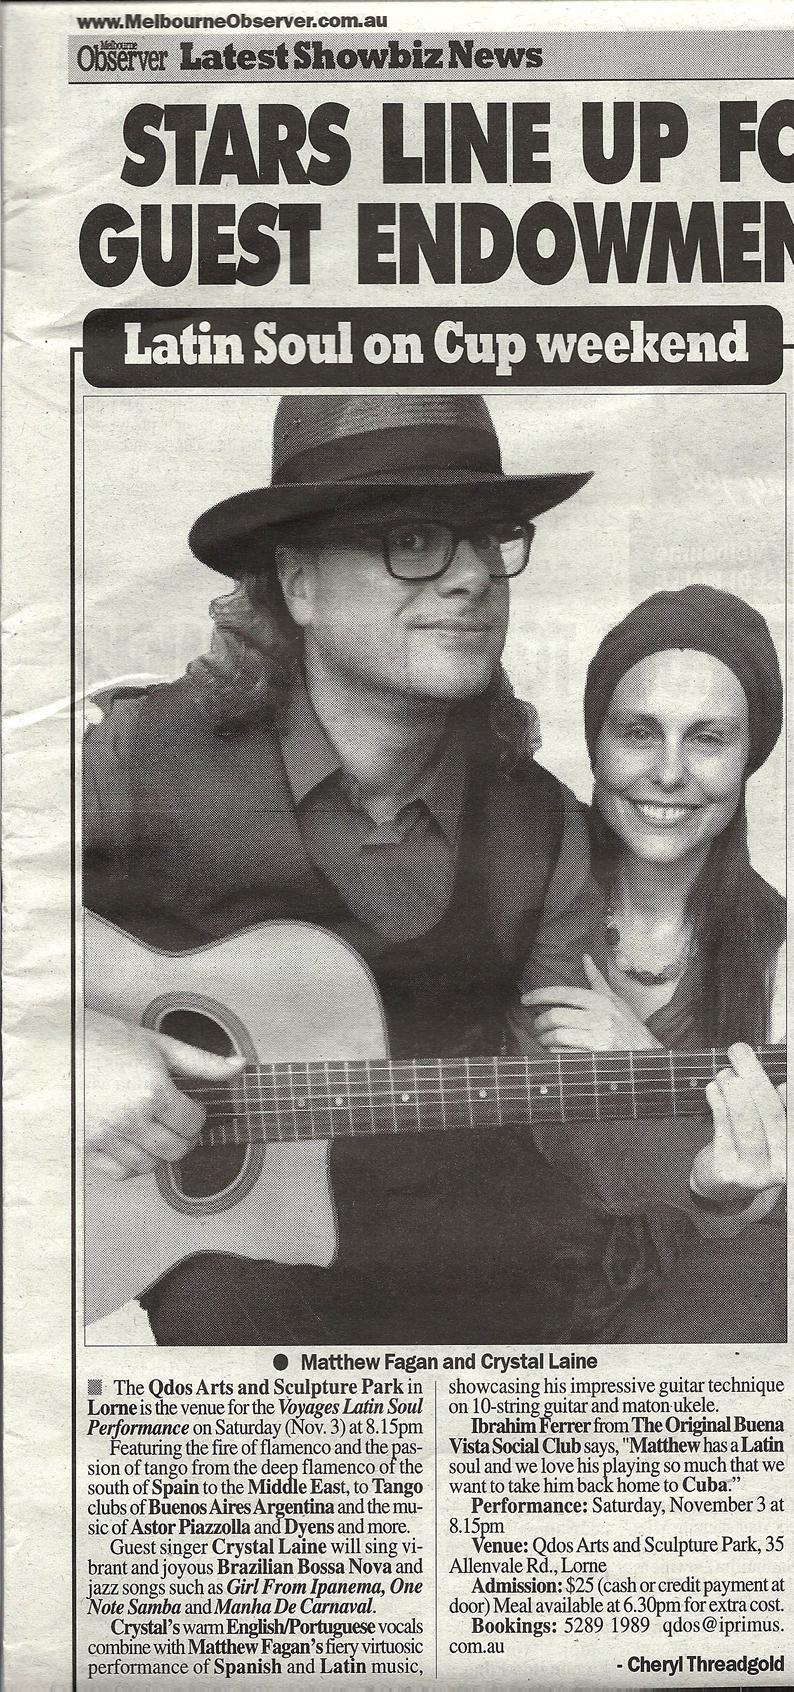 The Melbourne Observer